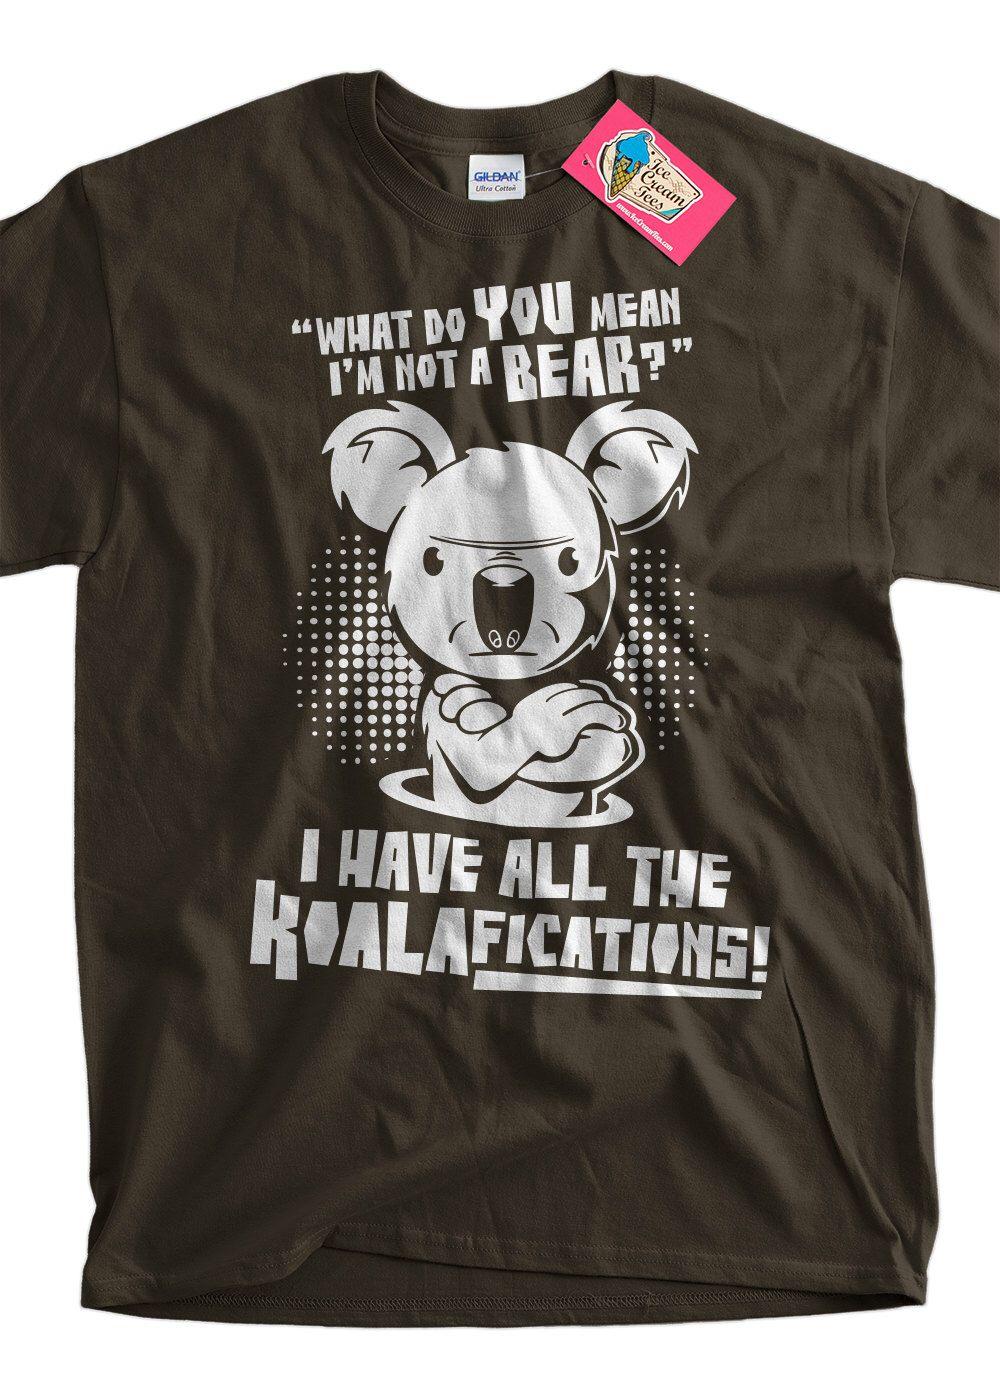 Funny shirt Koala Bear What do you mean Koalafications nerd hipster Geek Tshirt T-Shirt  Tee Shirt Mens Womens Ladies Youth Kids by IceCreamTees on Etsy https://www.etsy.com/listing/160058738/funny-shirt-koala-bear-what-do-you-mean